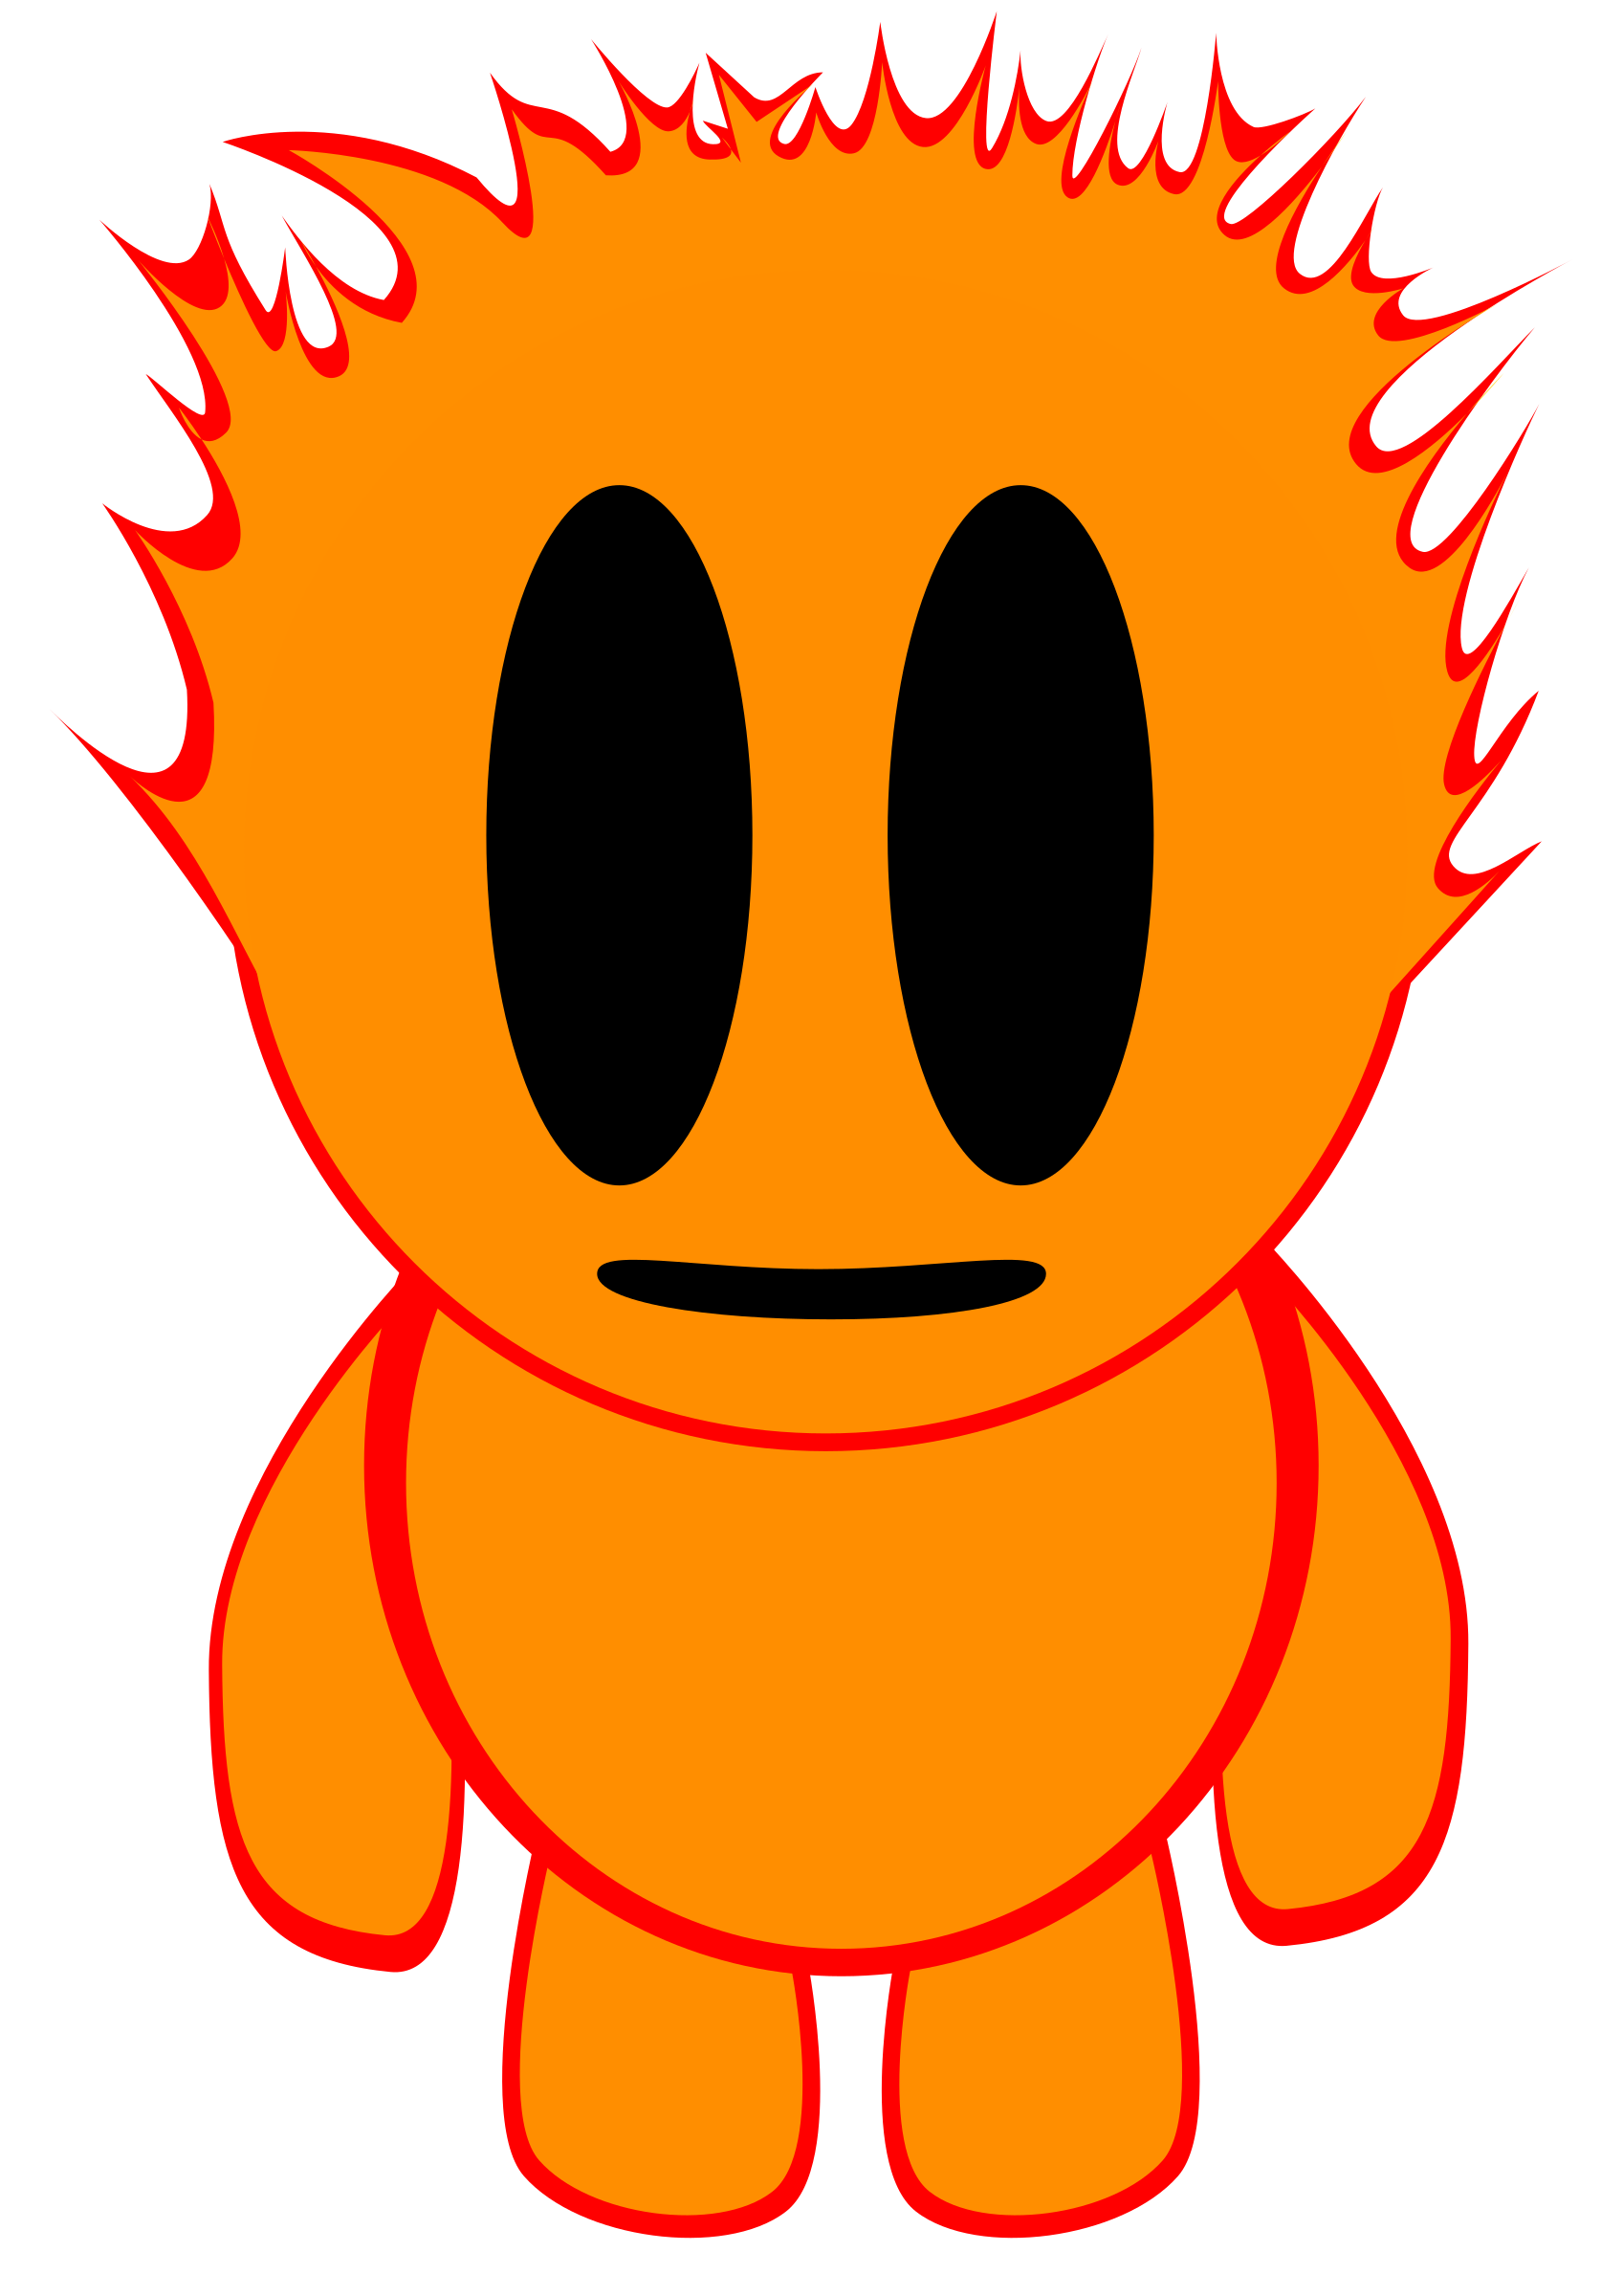 Line clipart flame. Boy big image png